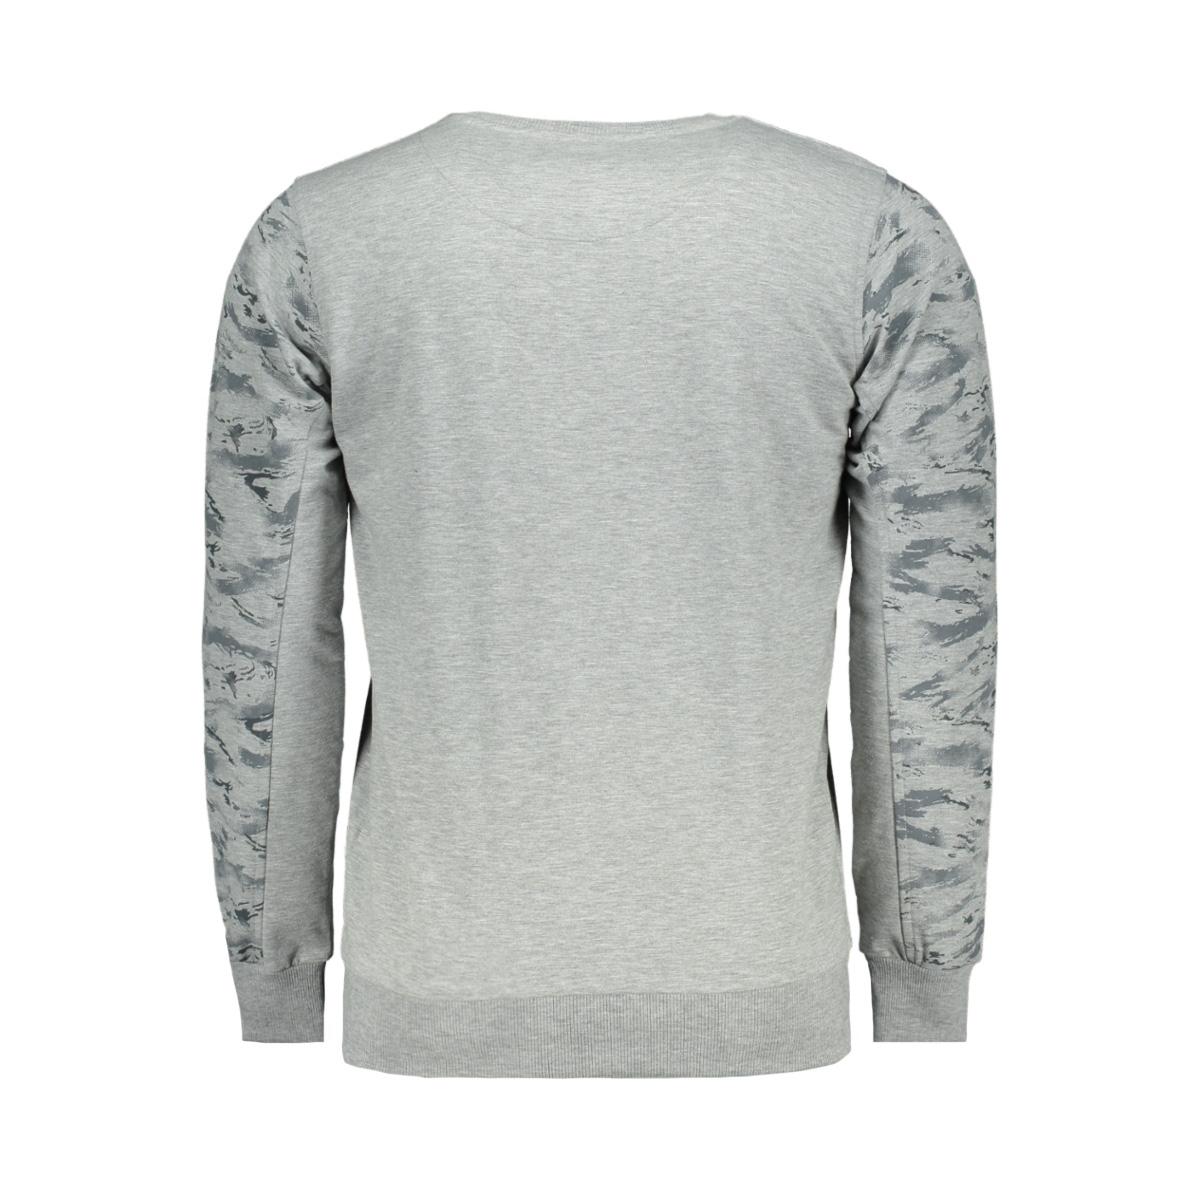 76121 gabbiano sweater grey